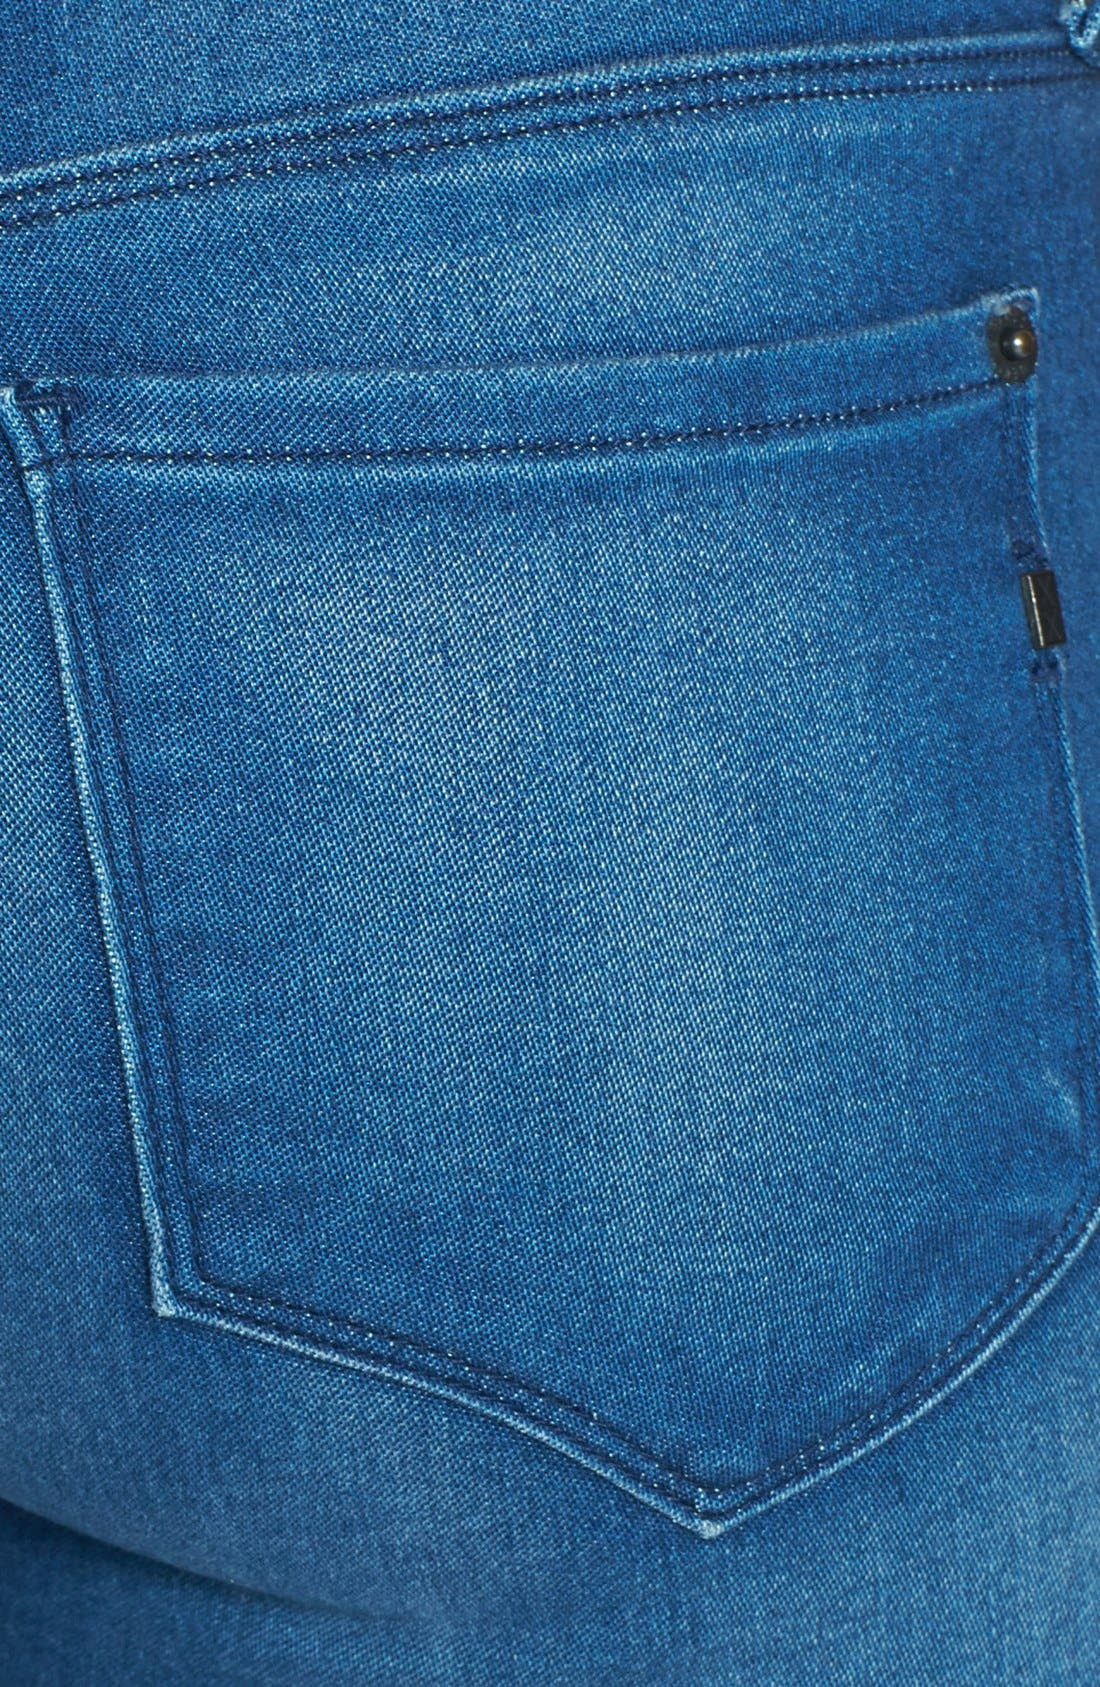 Alternate Image 3  - Genetic 'James' Skinny Ankle Jeans (Impact)